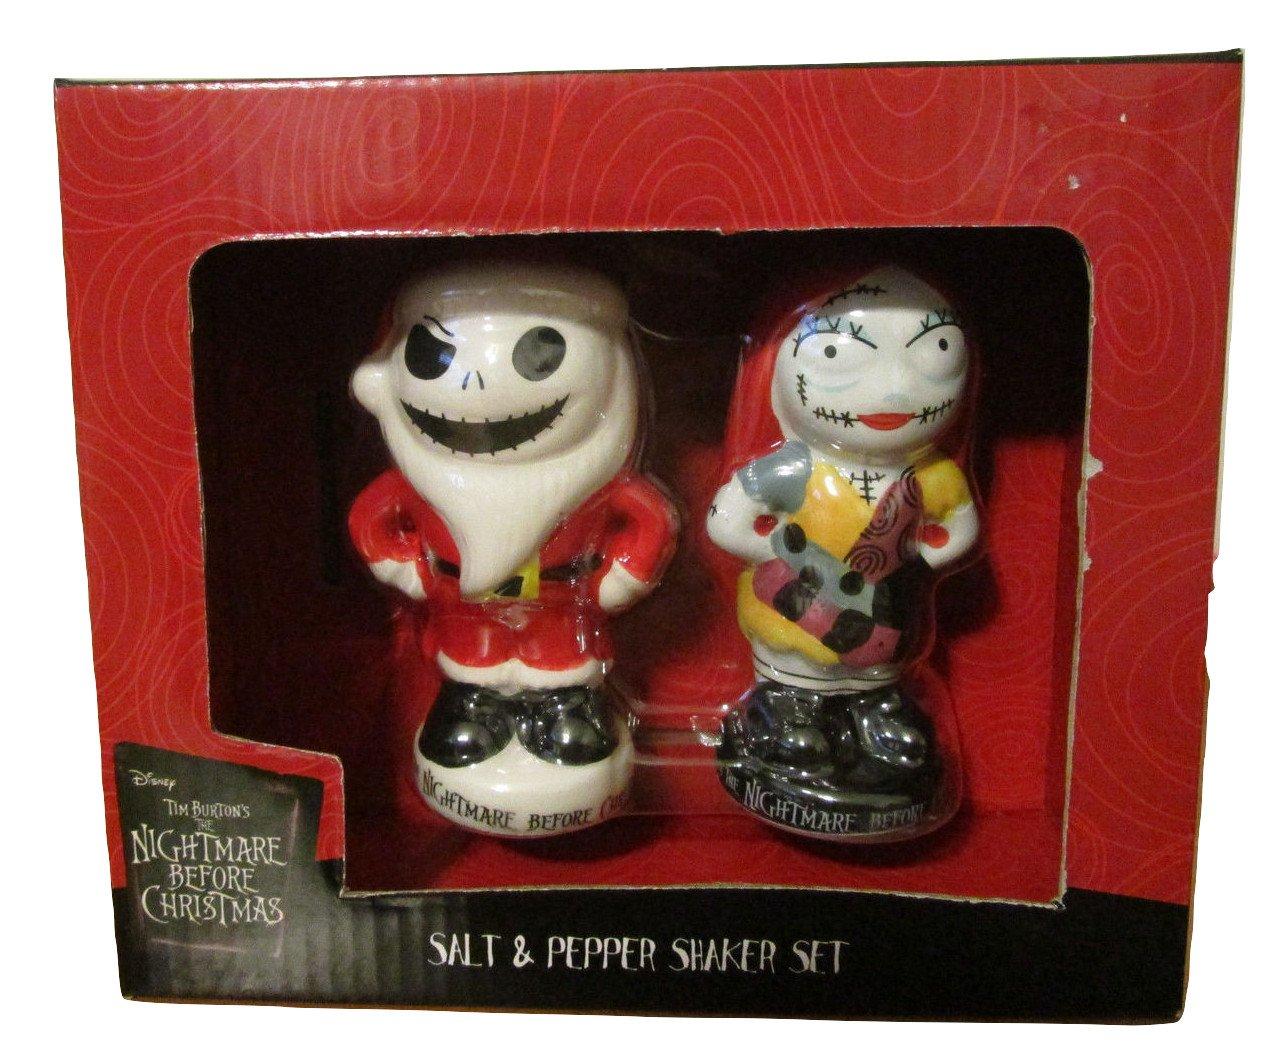 Amazon.com: Disney Nightmare Before Christmas Salt and Pepper Shaker ...